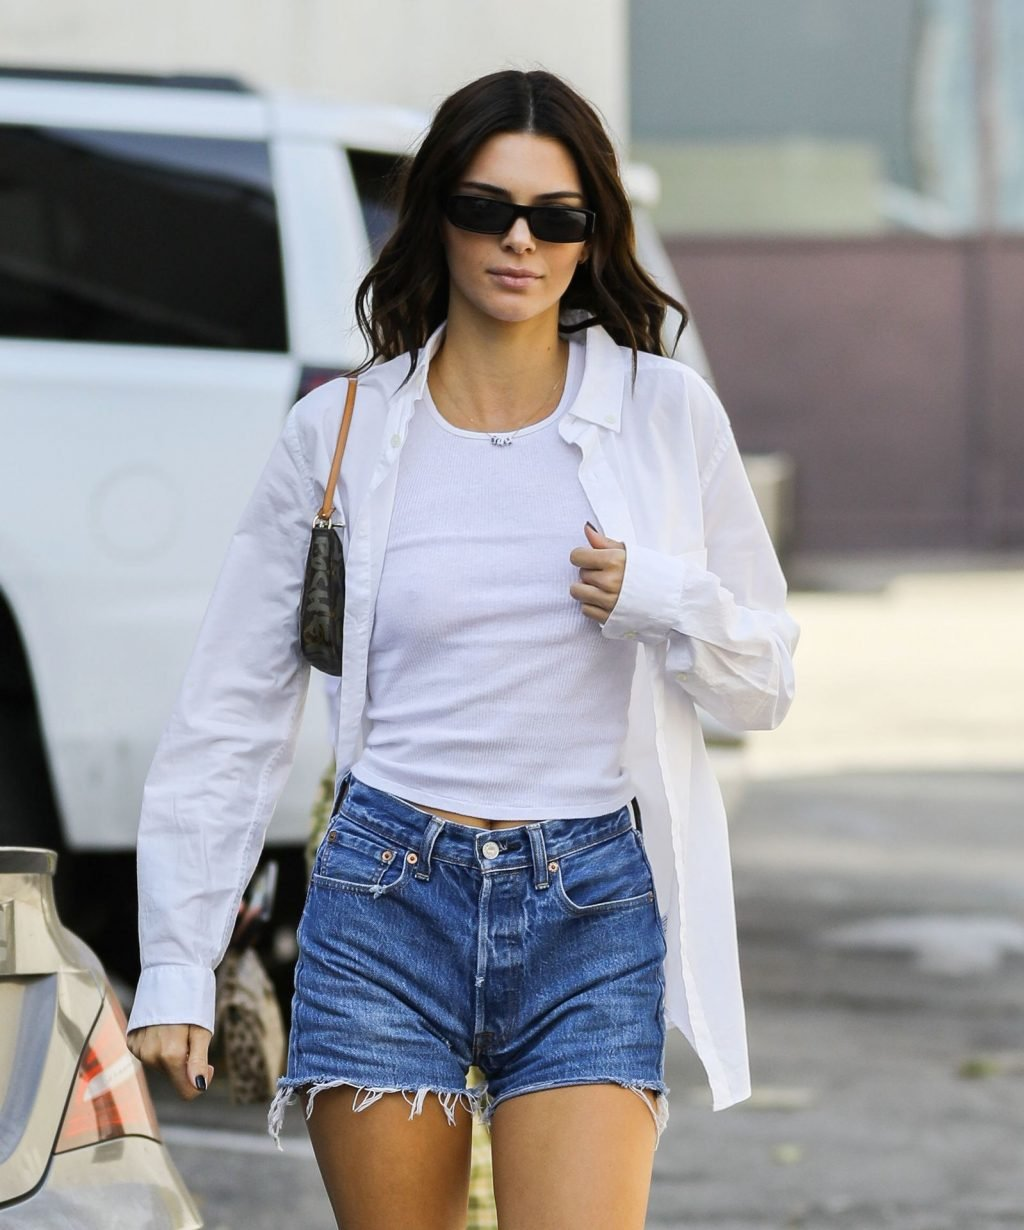 Kendall Jenner Braless (30 Photos)